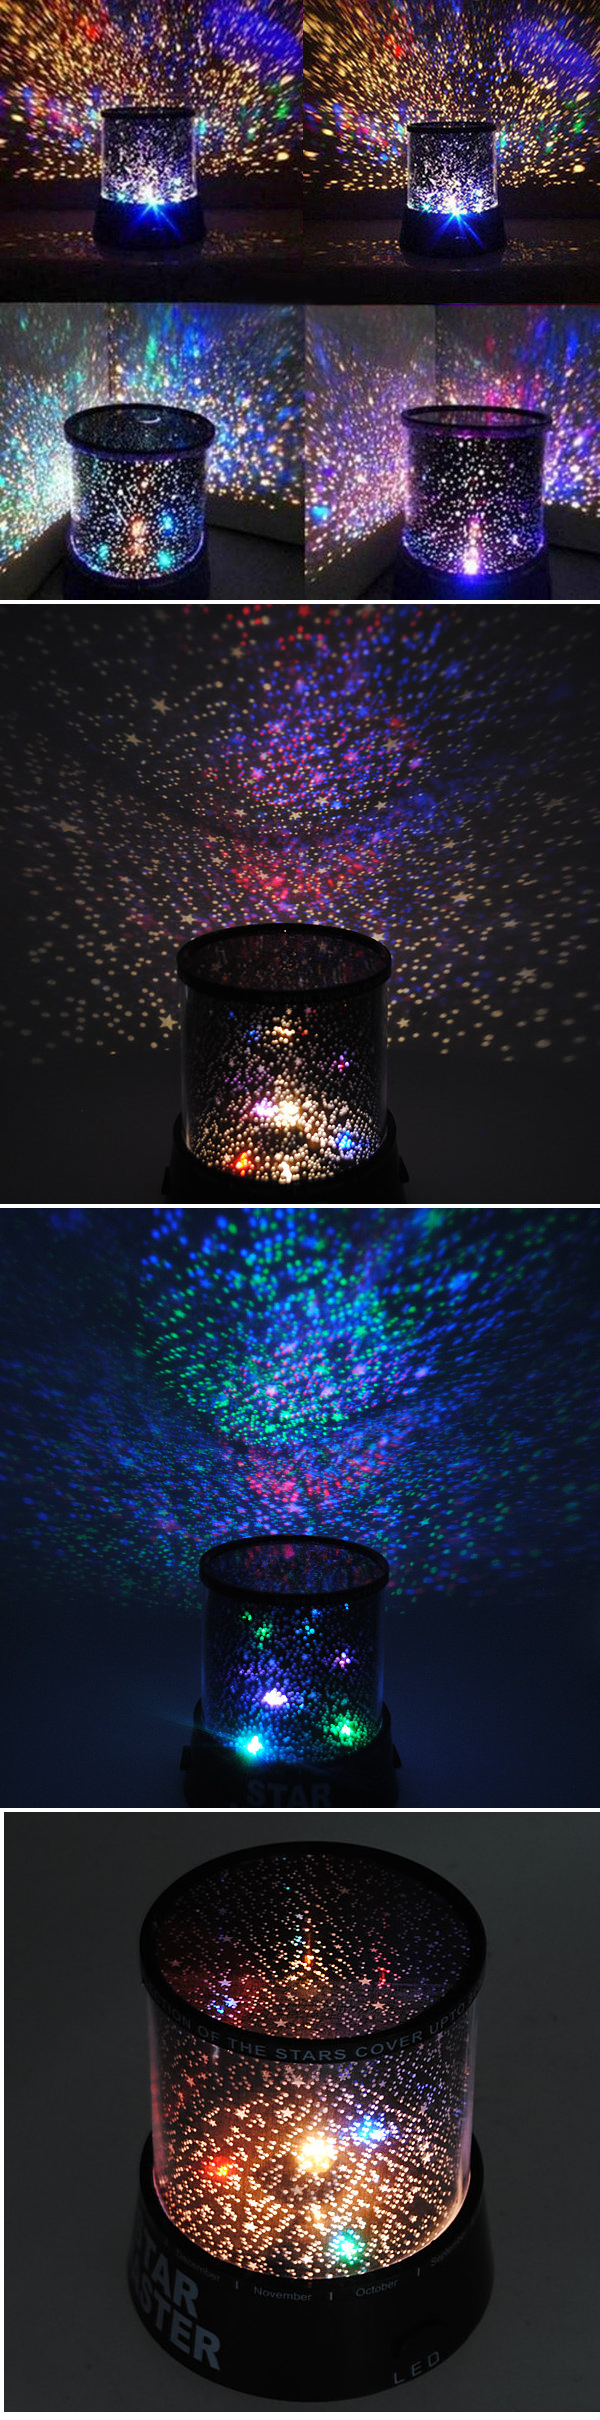 Four seasons star projector lamp - Amazing Laser Projector Lamp Sky Star Cosmos Night Light